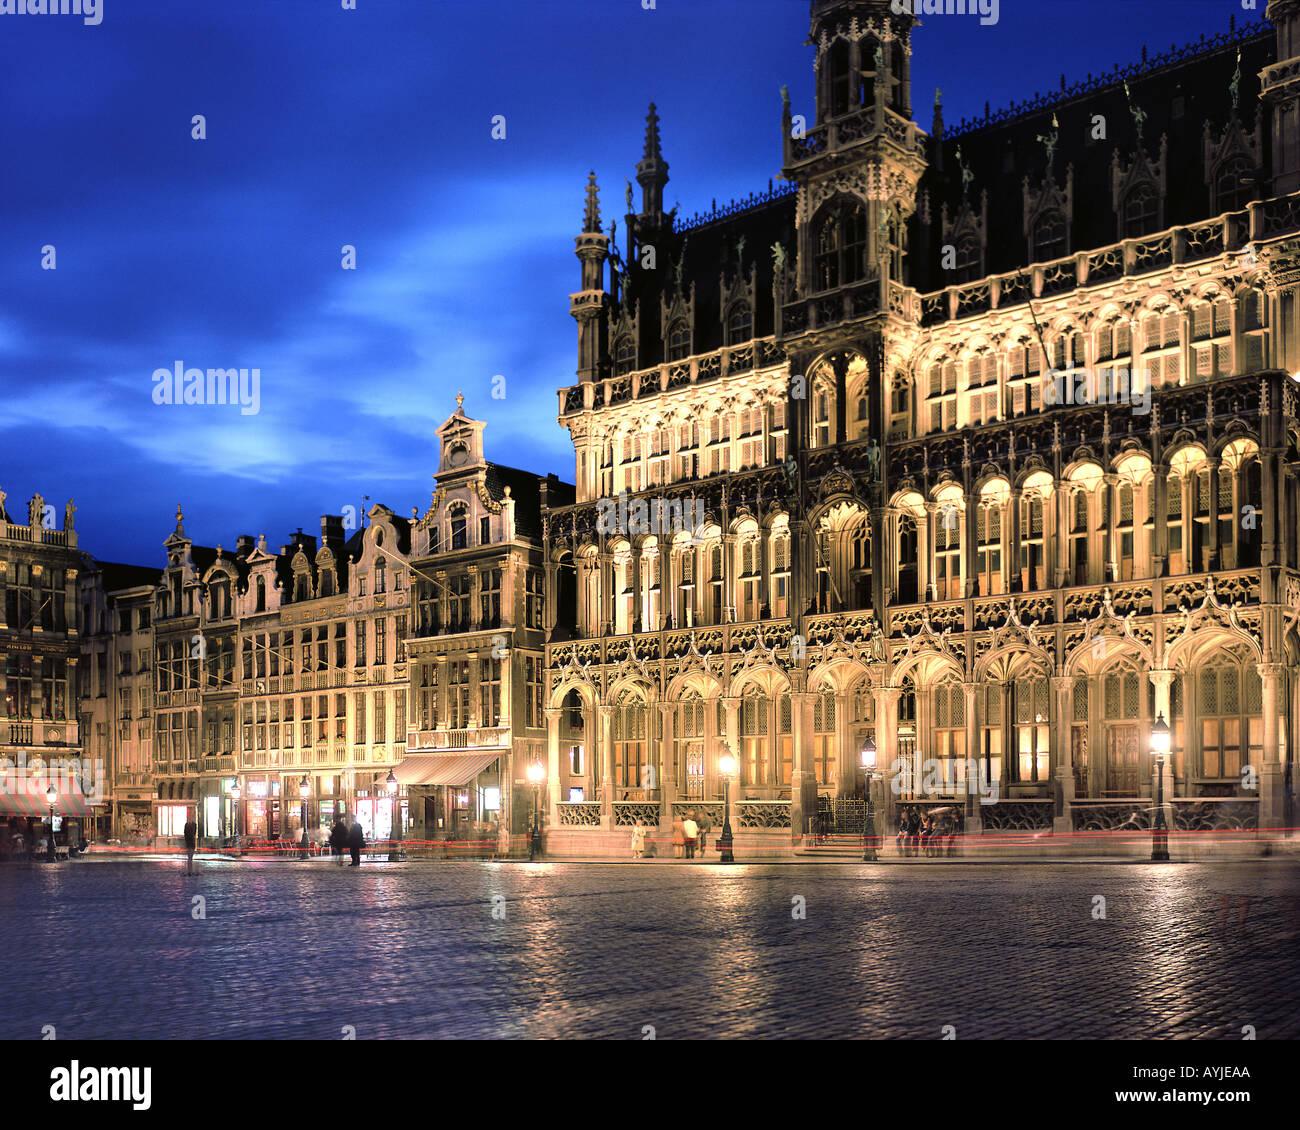 BE - BRUXELLES: Grand Place bei Nacht Stockbild